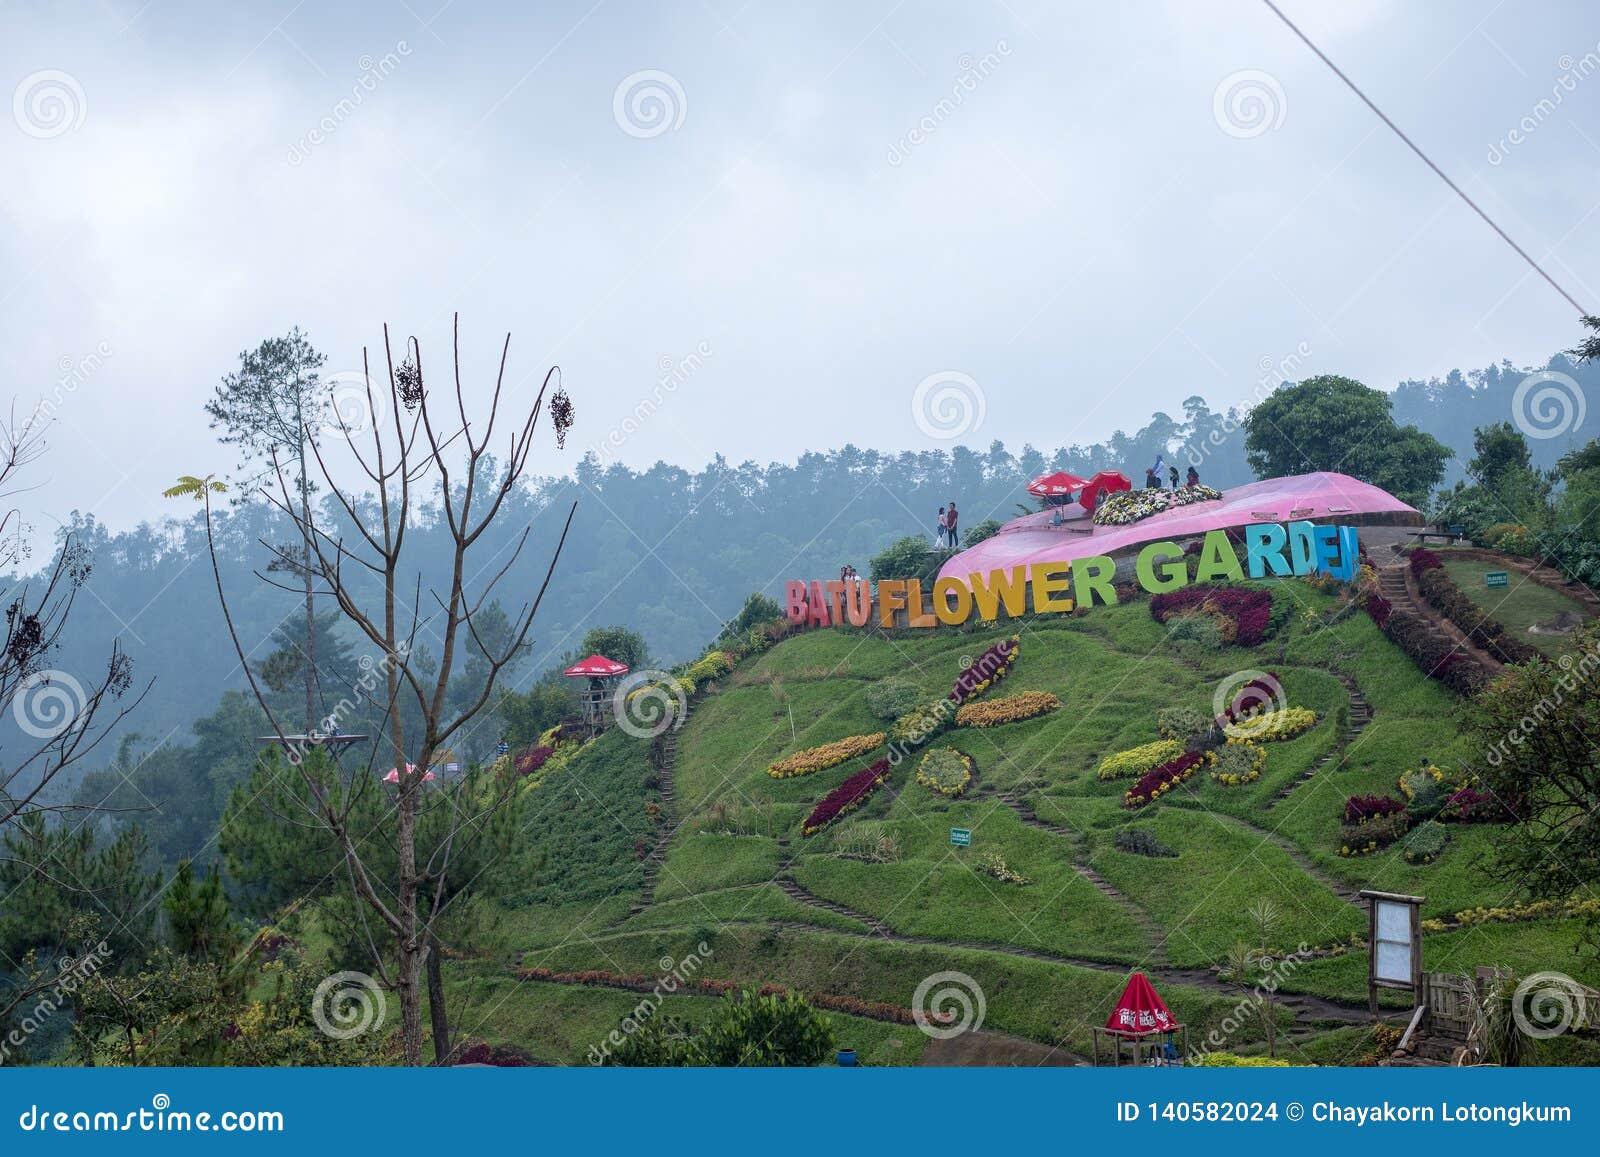 Selecta Flower Garden In Batu Malang Indonesia Editorial Stock Image Image Of Garden Coban 140582024